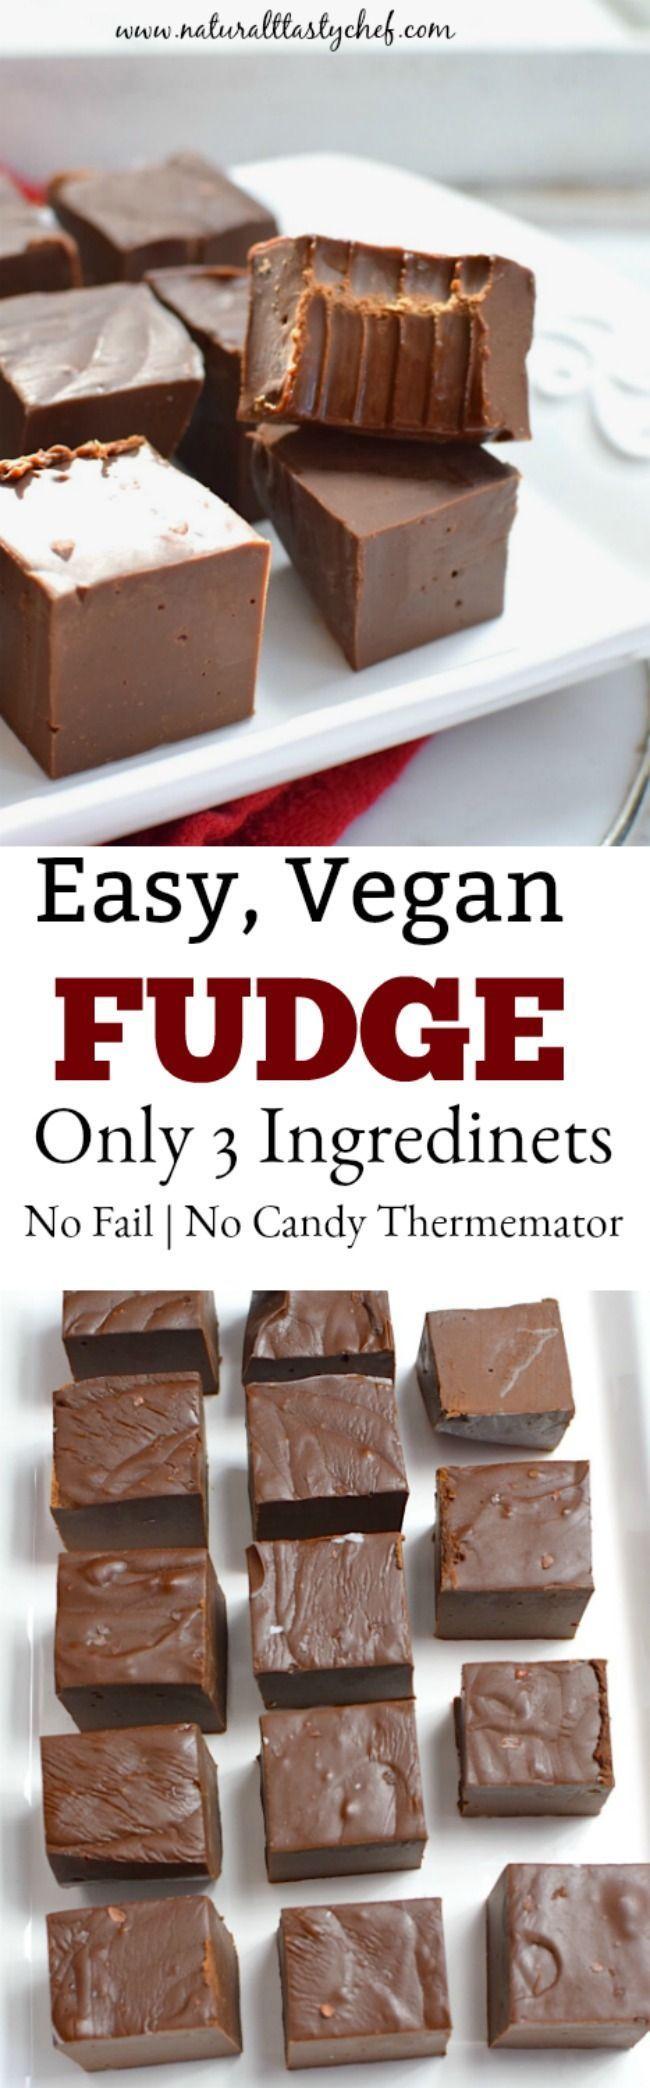 Easy, No-Fail Vegan Chocolate Fudge NO FAIL, 3 ingredient VEGAN chocolate fudge recipe that's so easy to make and totally delicious!